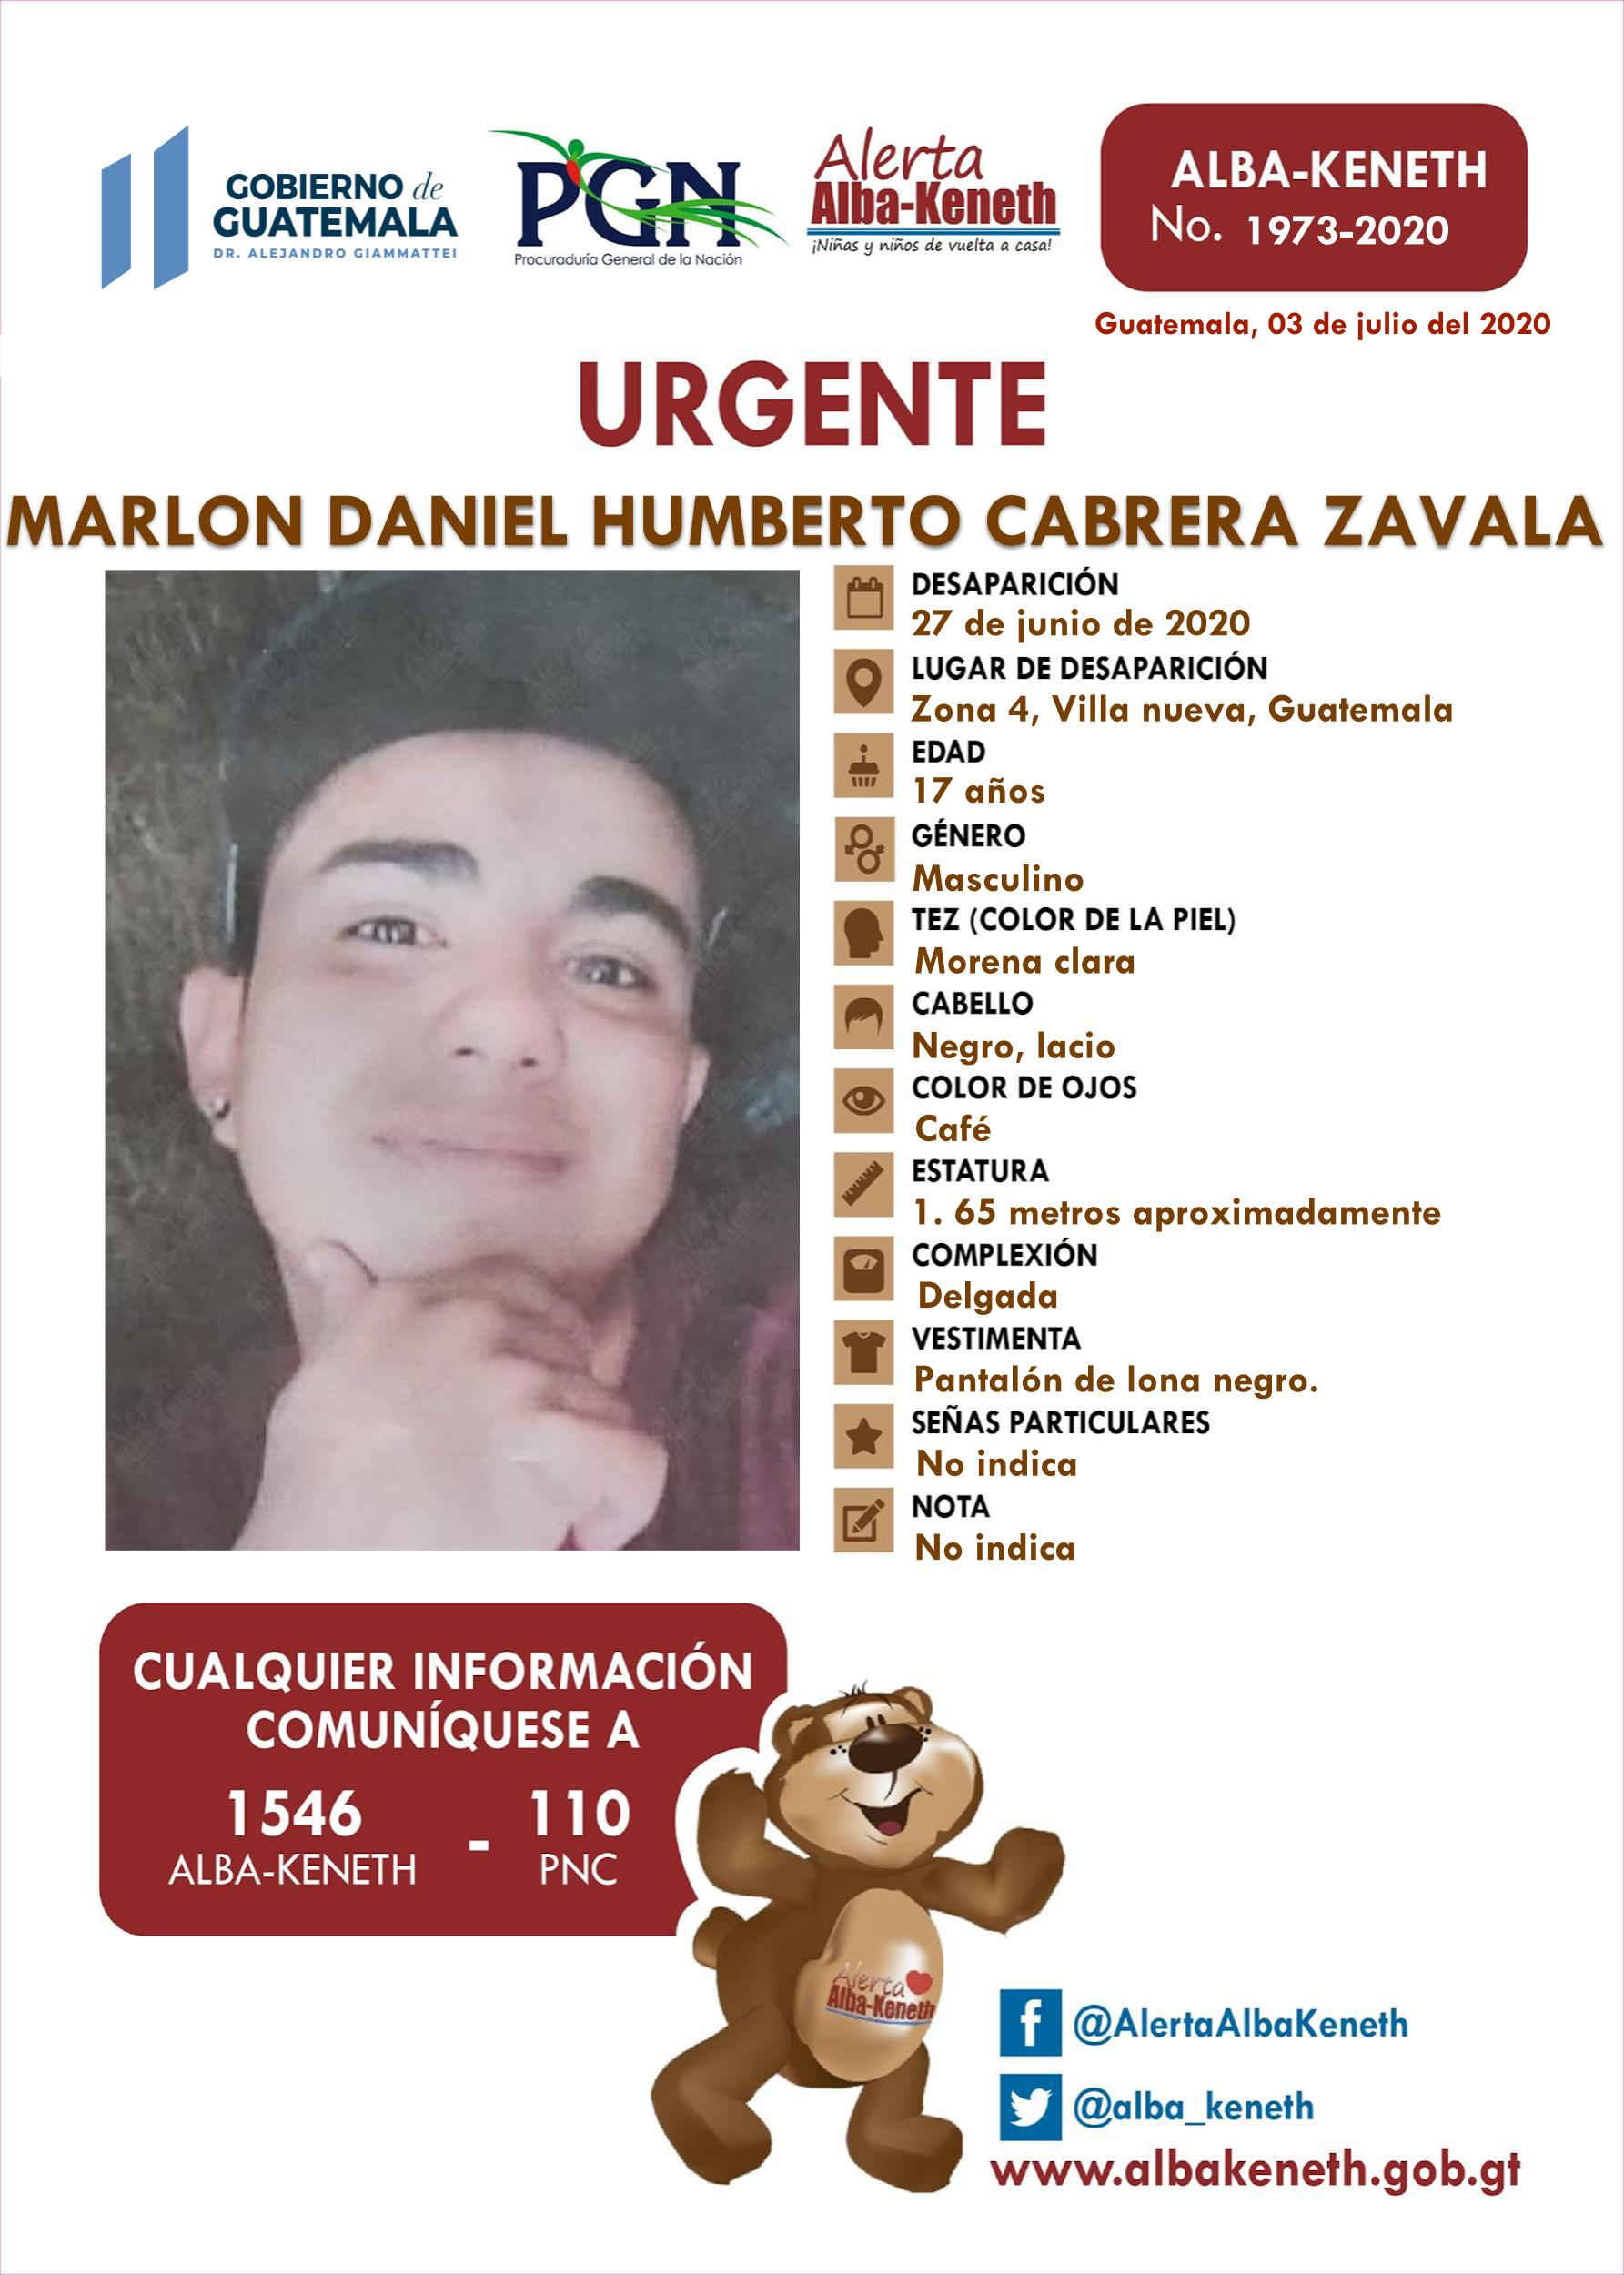 Marlon Daniel Humberto Vabrera Zavala